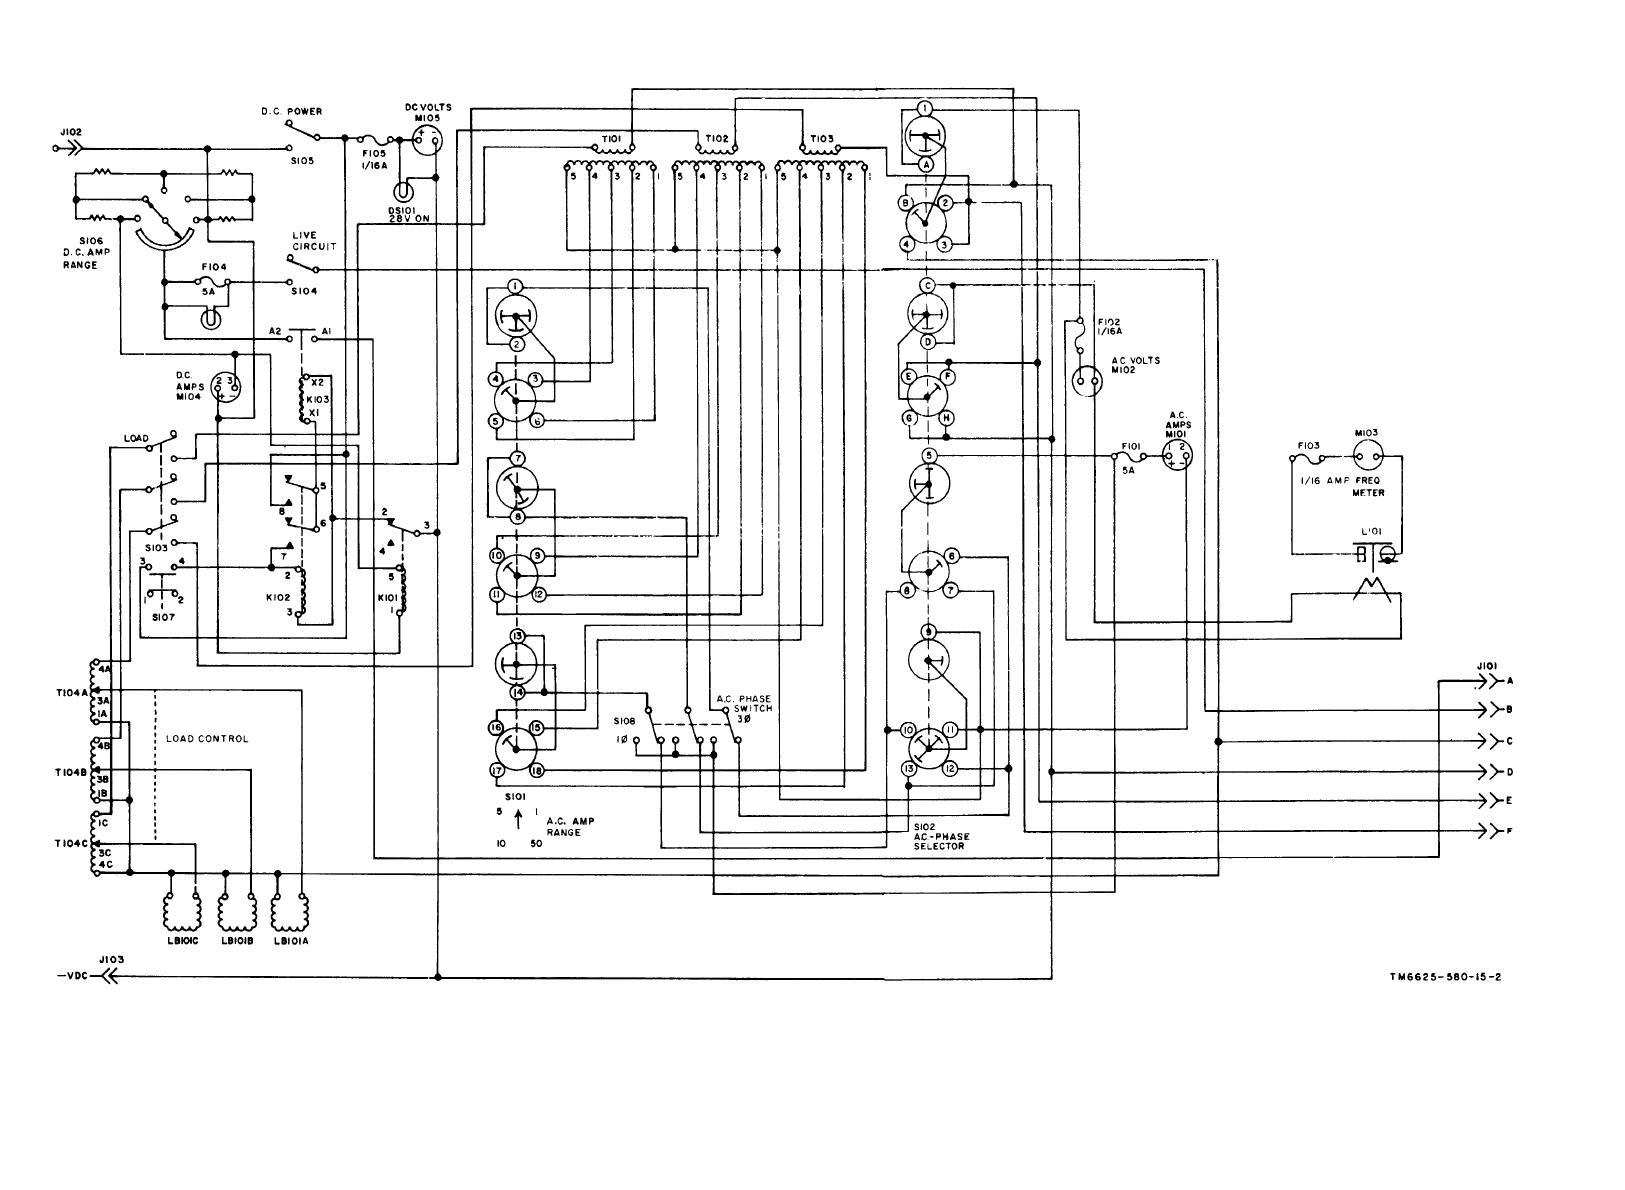 Power Supply Bg602 Circuit Diagram Powersupplycircuit Circuit